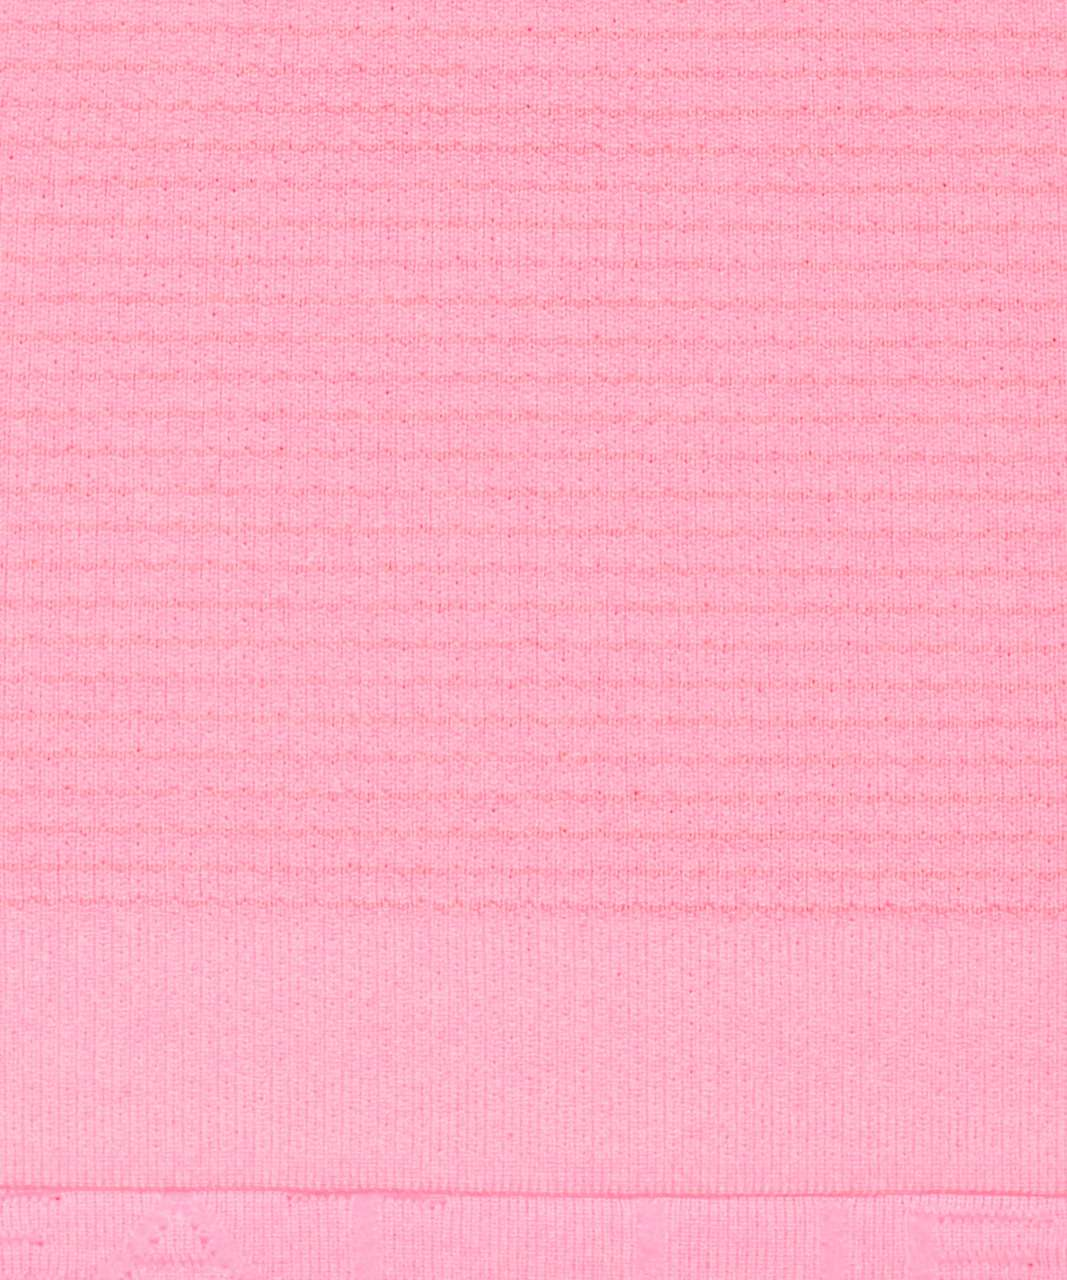 Lululemon Swiftly Tech Short Sleeve Crew - Pink Shell / White